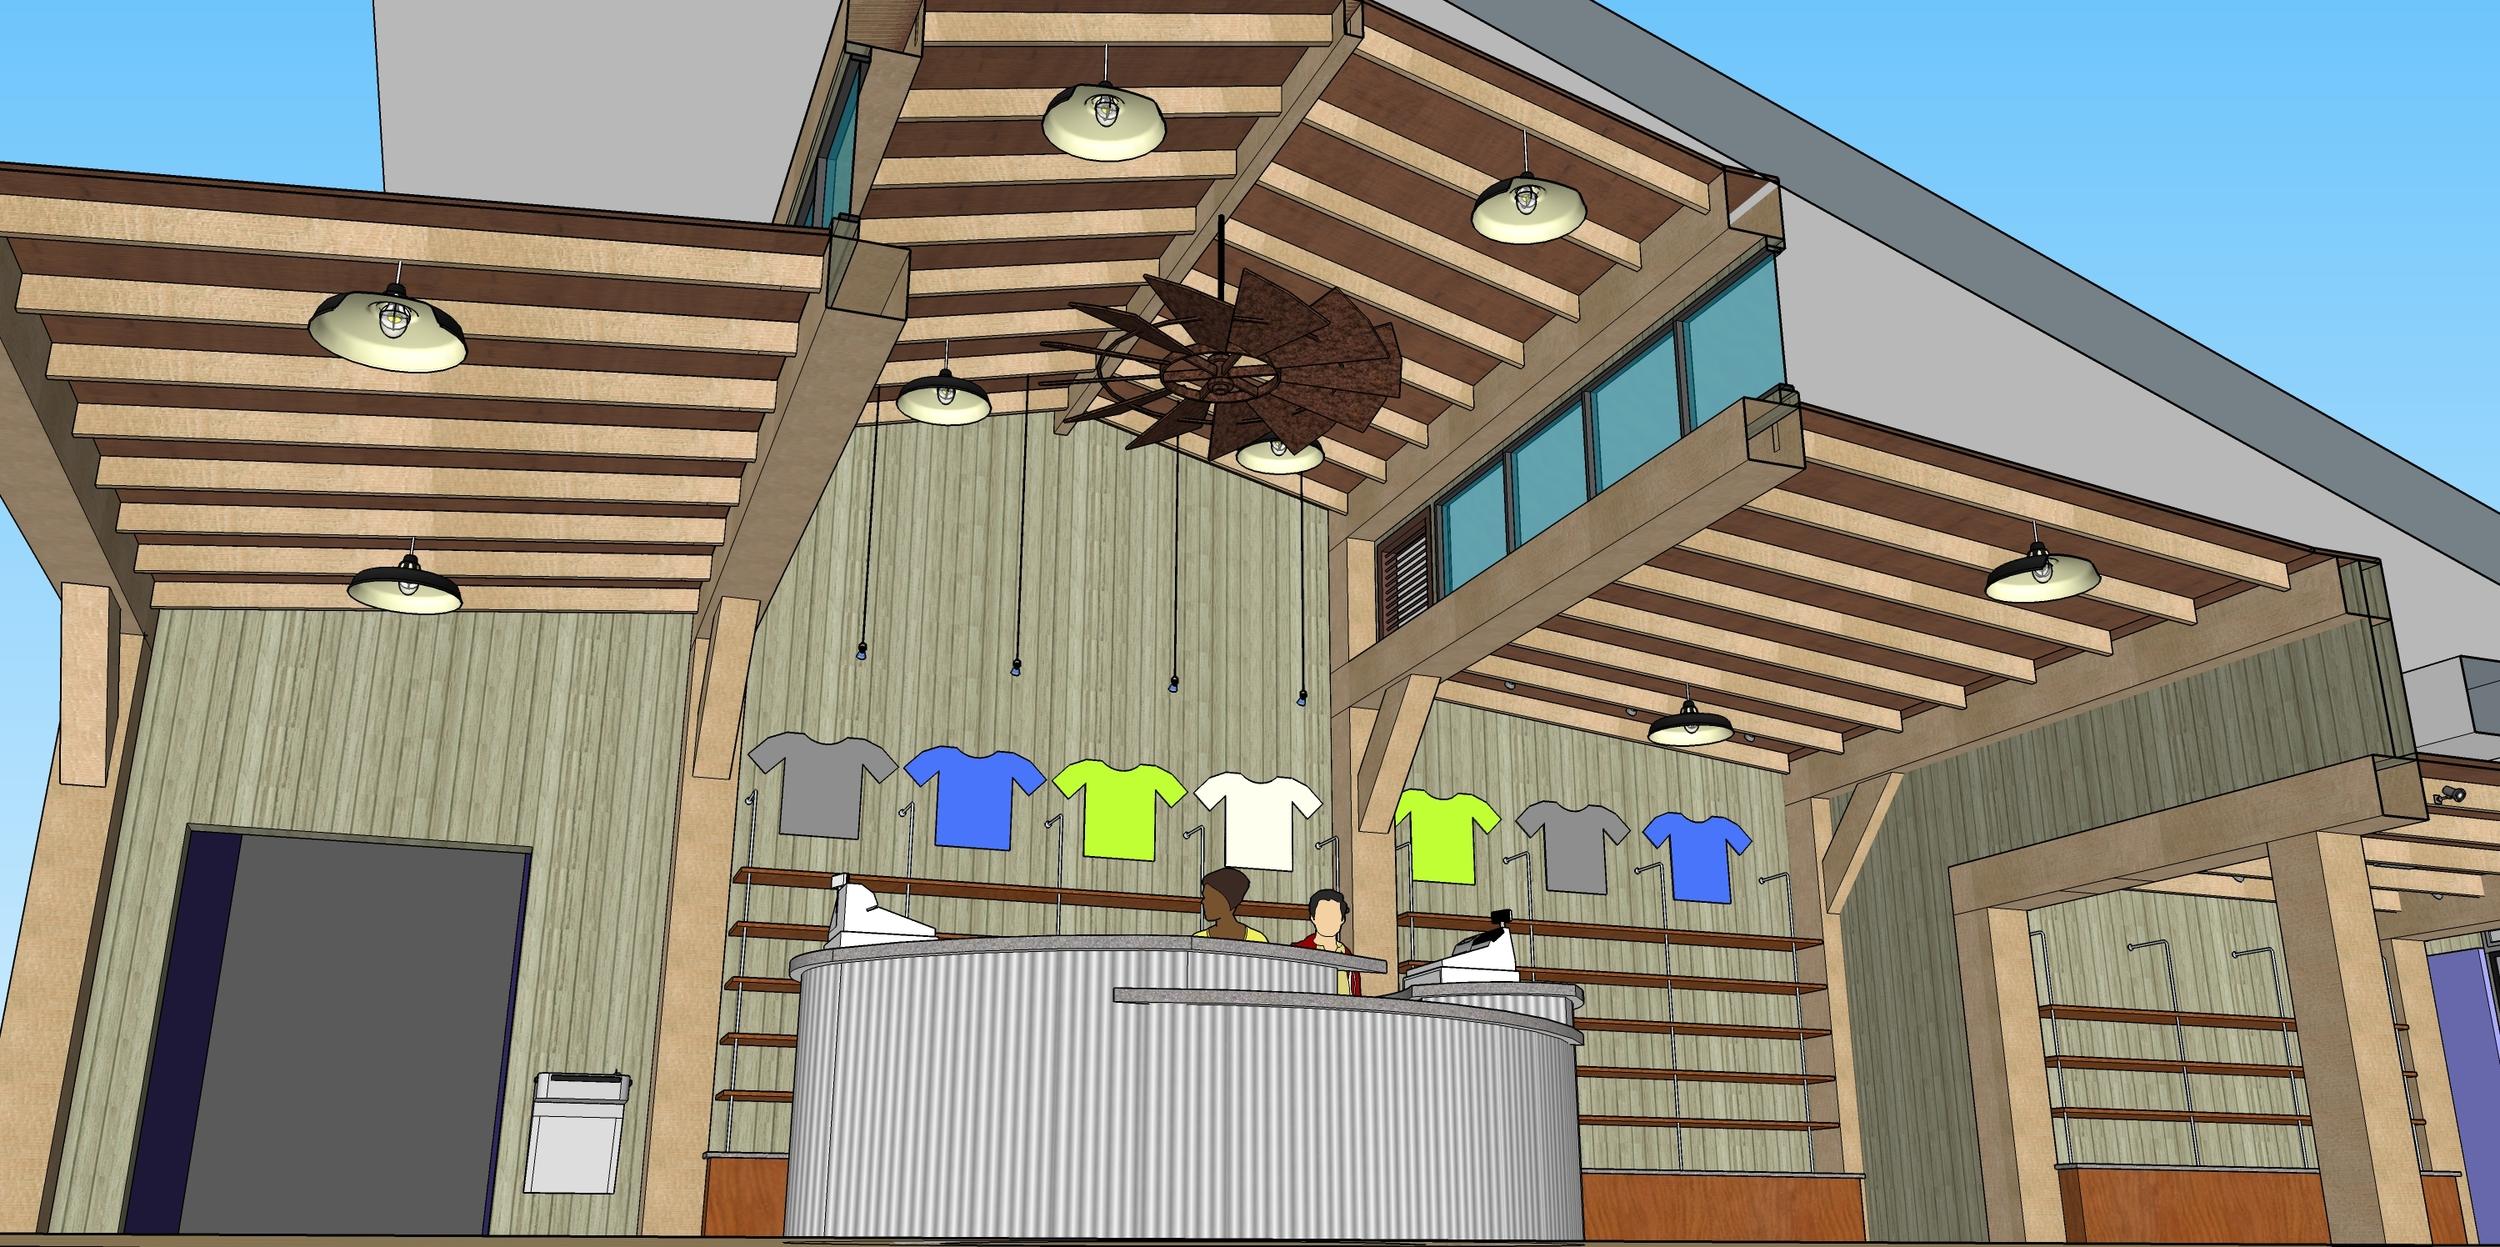 B&J Gift Shop_Ceiling Perspective.jpg